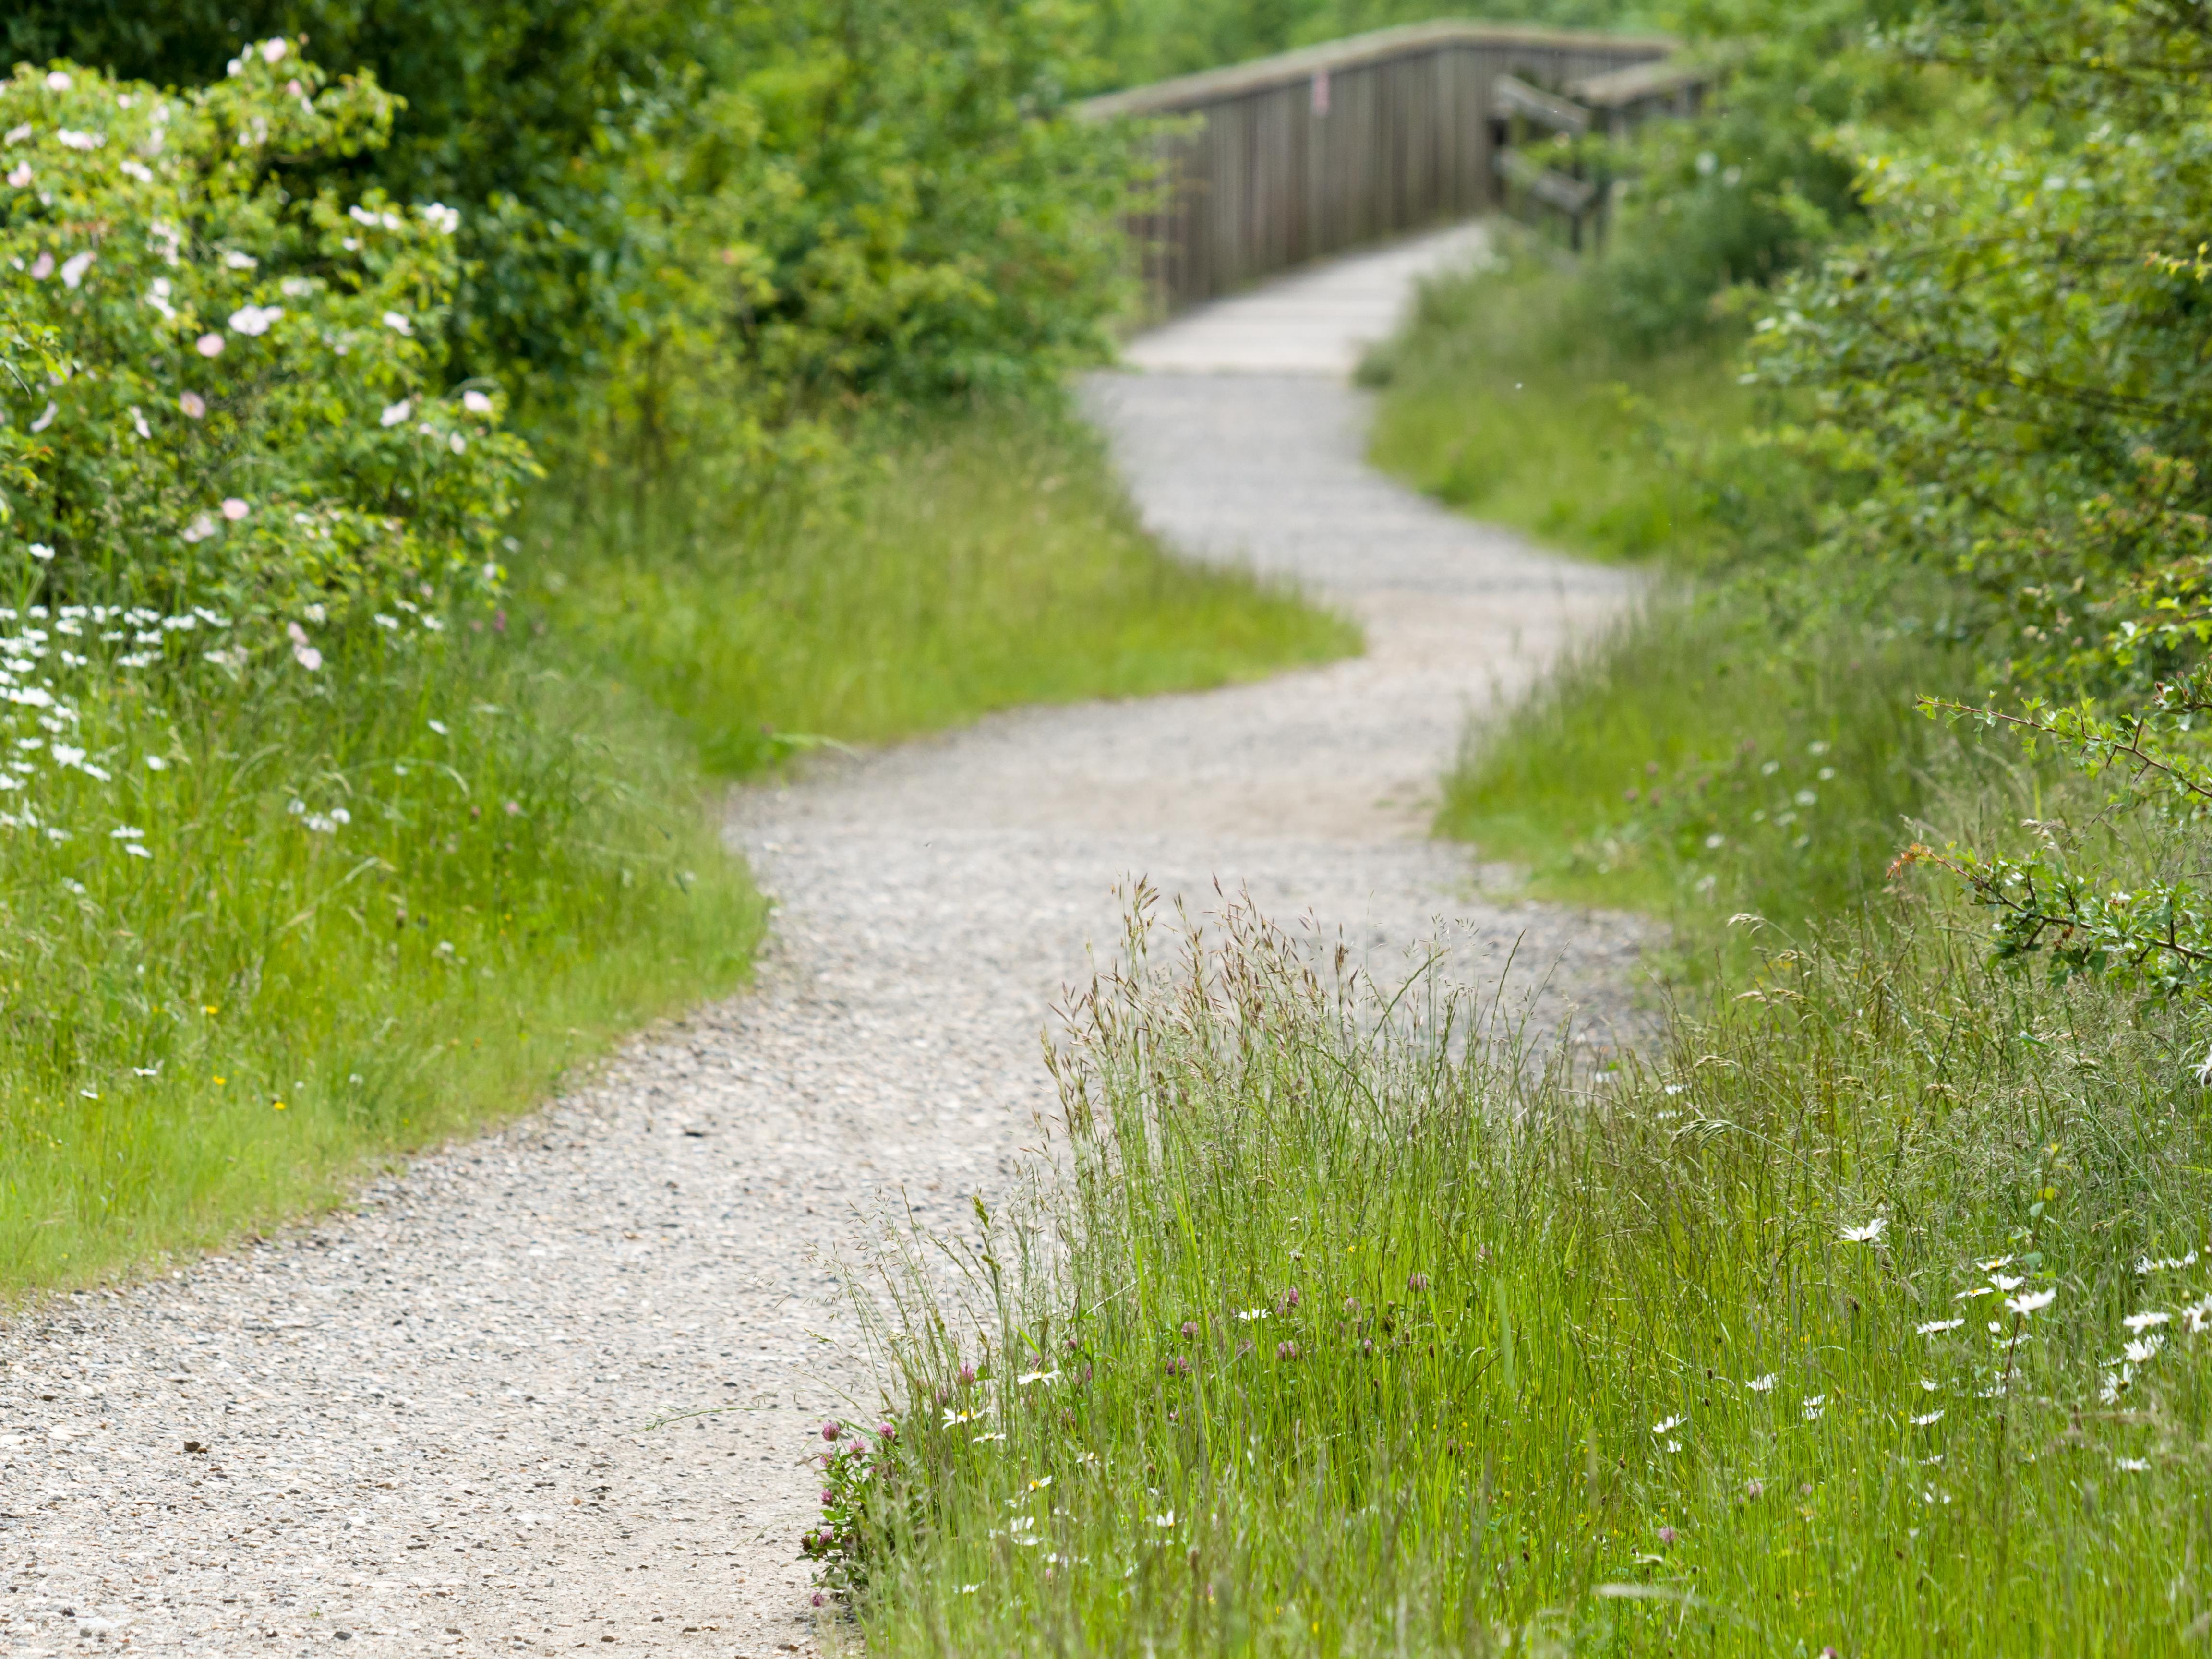 File:Winding path (14354572446).jpg - Wikimedia Commons